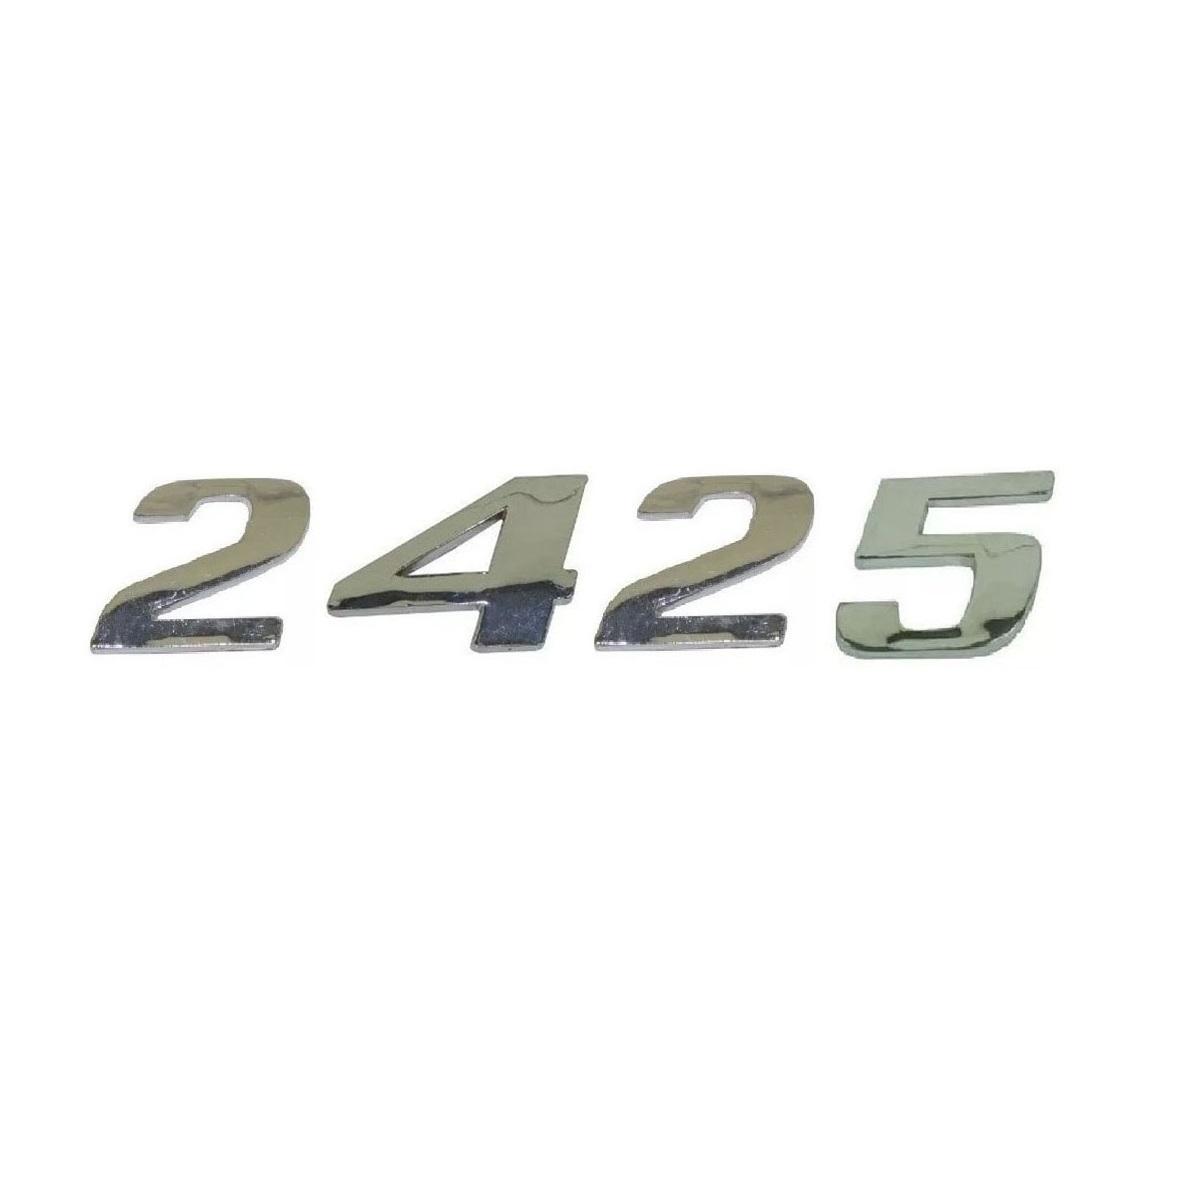 Emblema Mb Atego 2425 Cromado